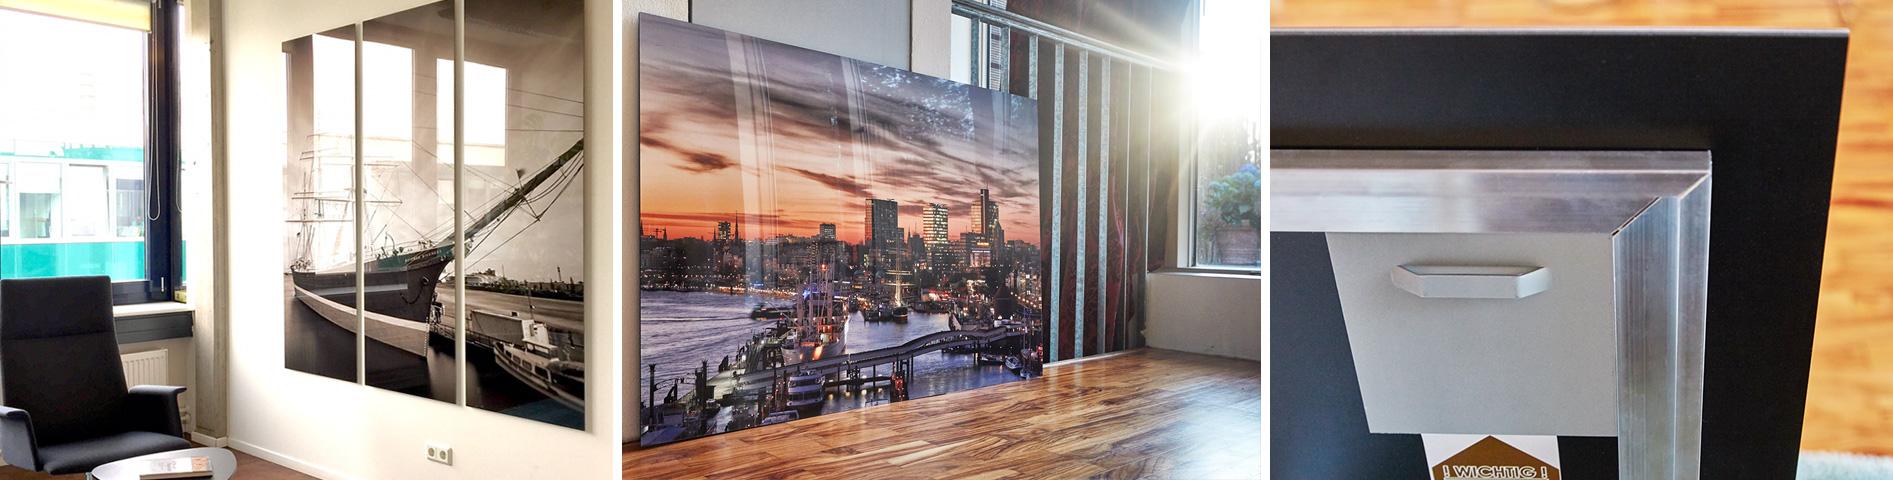 hamburg acrylglasbilder ihr glasbild auf alu dibond. Black Bedroom Furniture Sets. Home Design Ideas